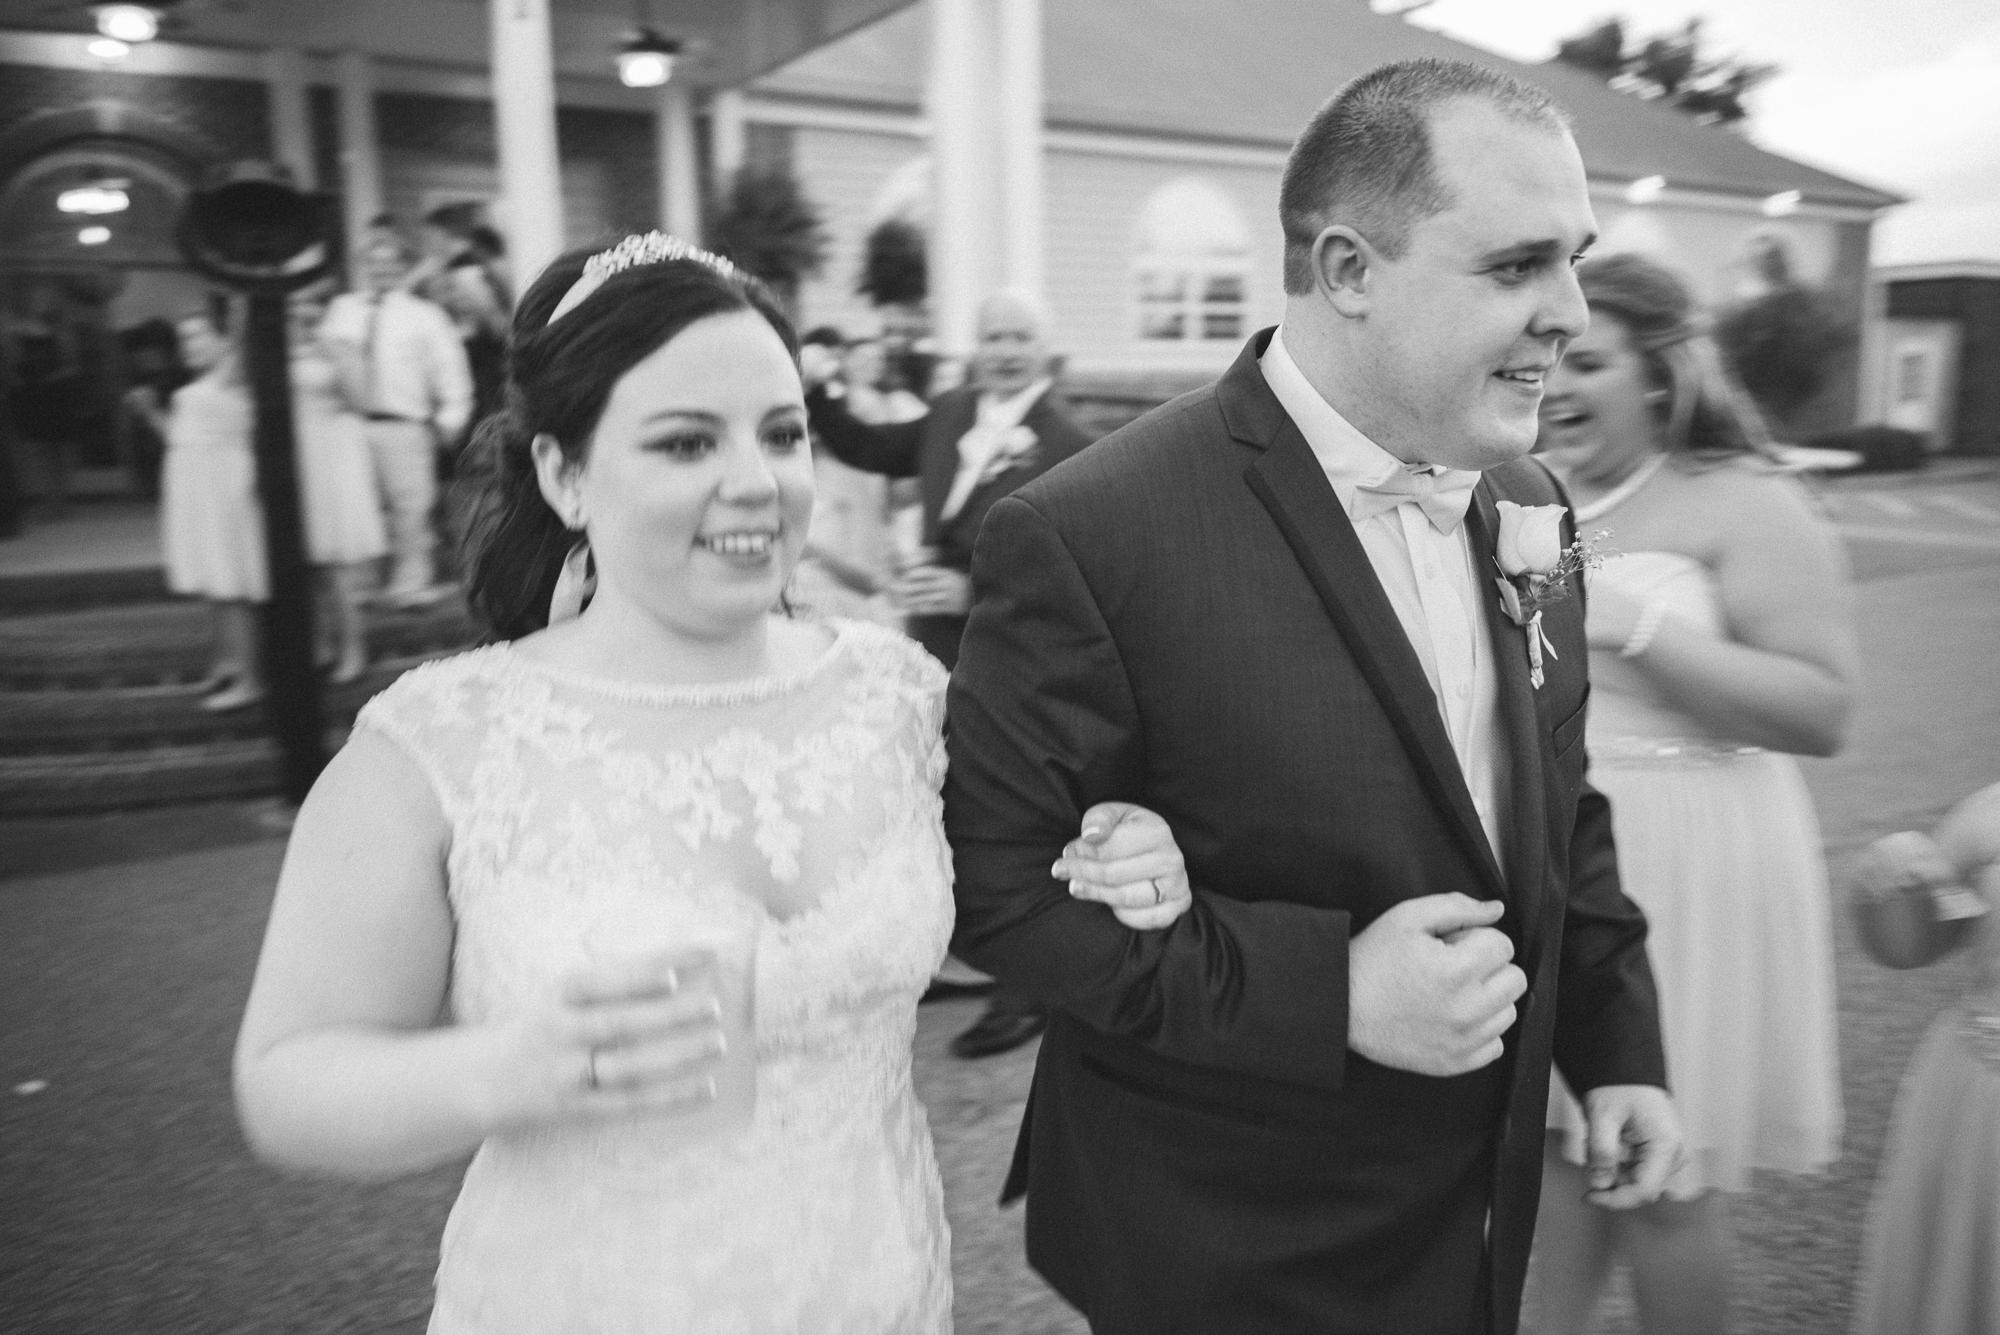 Emily-Shay-wedding-blog-31.jpg